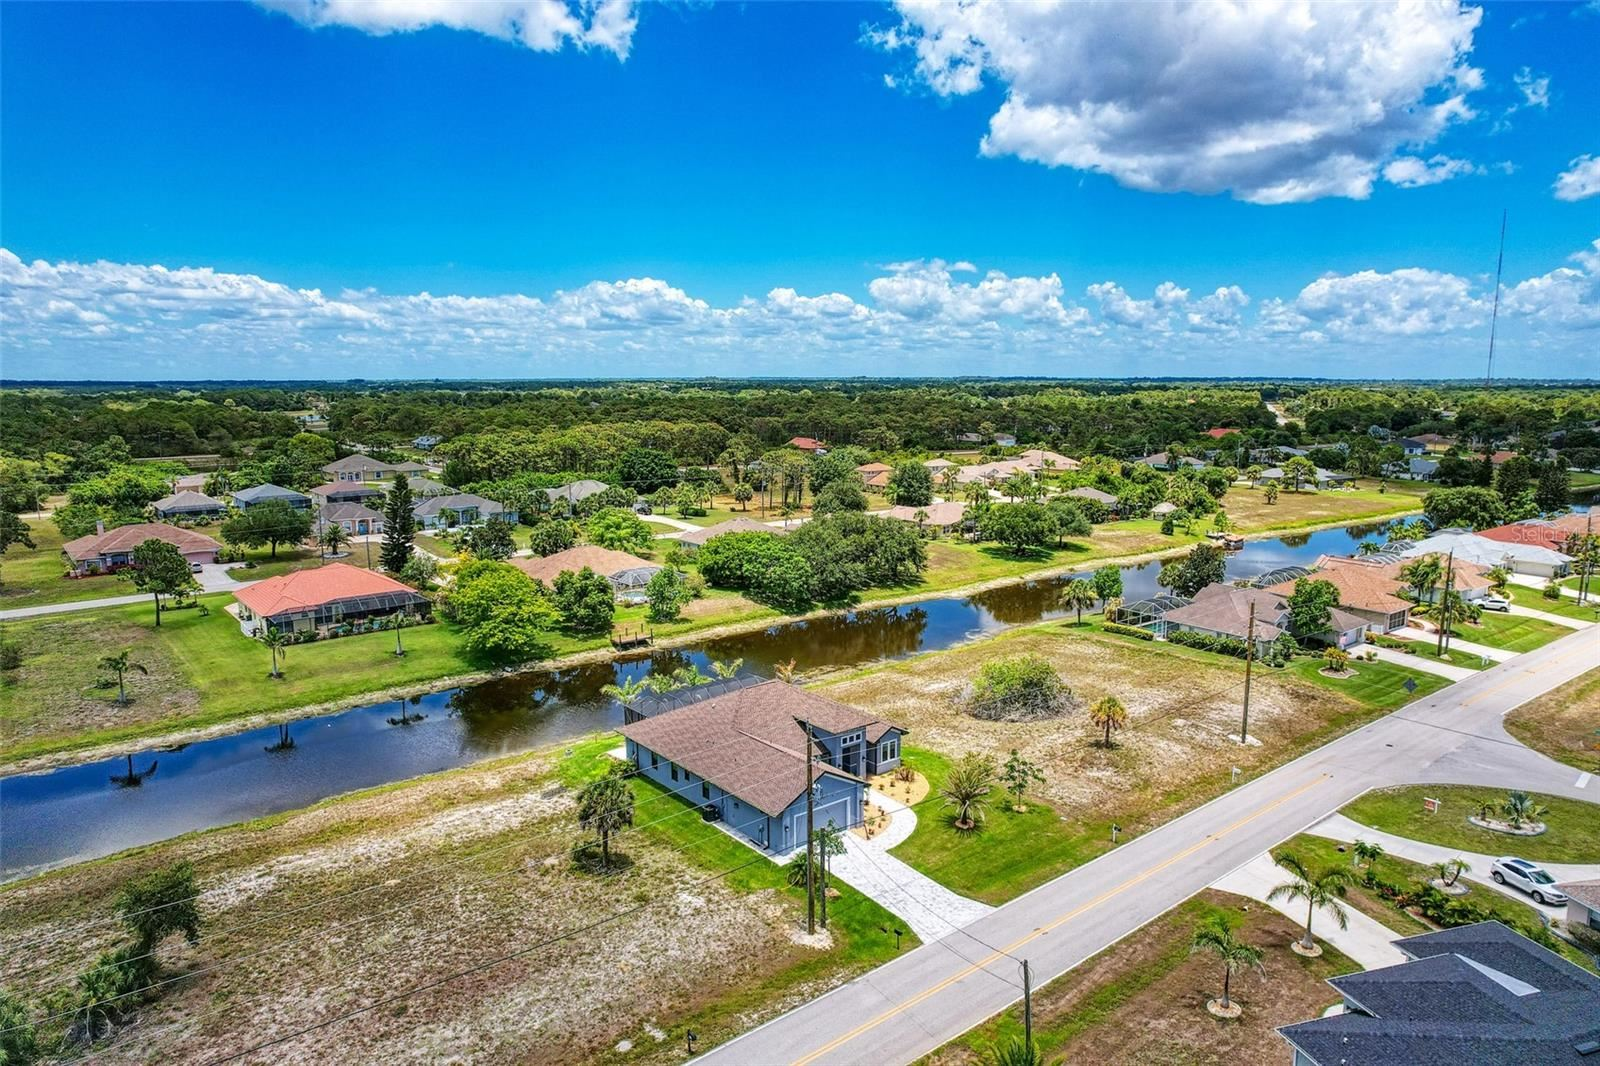 Photo of 741 ROTONDA CIRCLE, ROTONDA WEST, FL 33947 (MLS # N6115909)